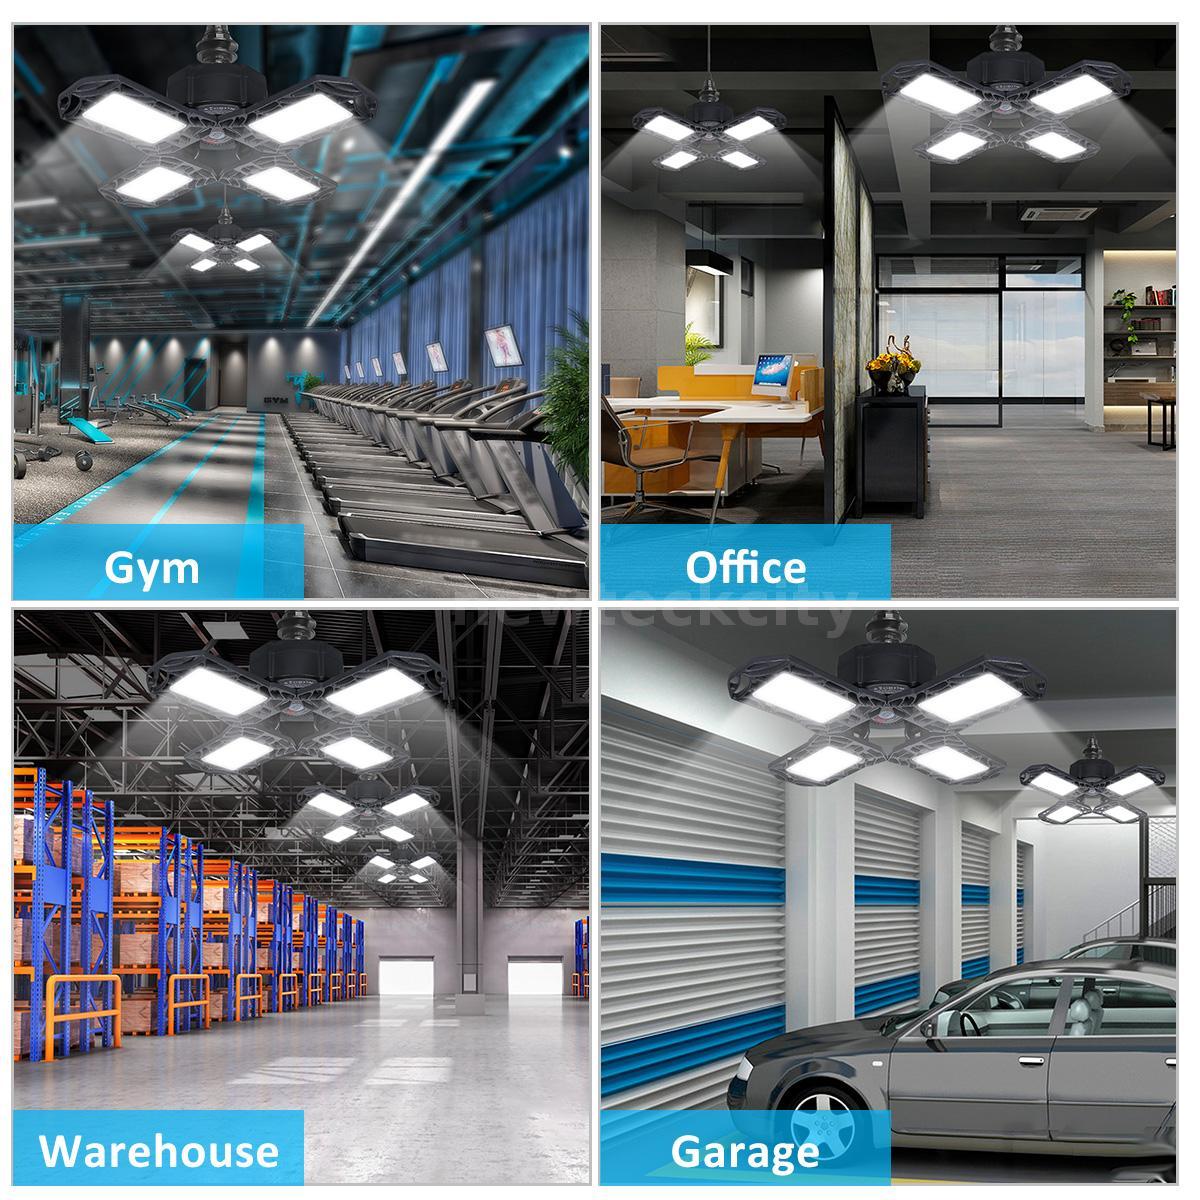 Corridor 10000LM Cool White Deformable Foldable Garage Ceiling Lamp for Garage Stadium Basement 100W LED Garage Light Warehouse Workshop Office